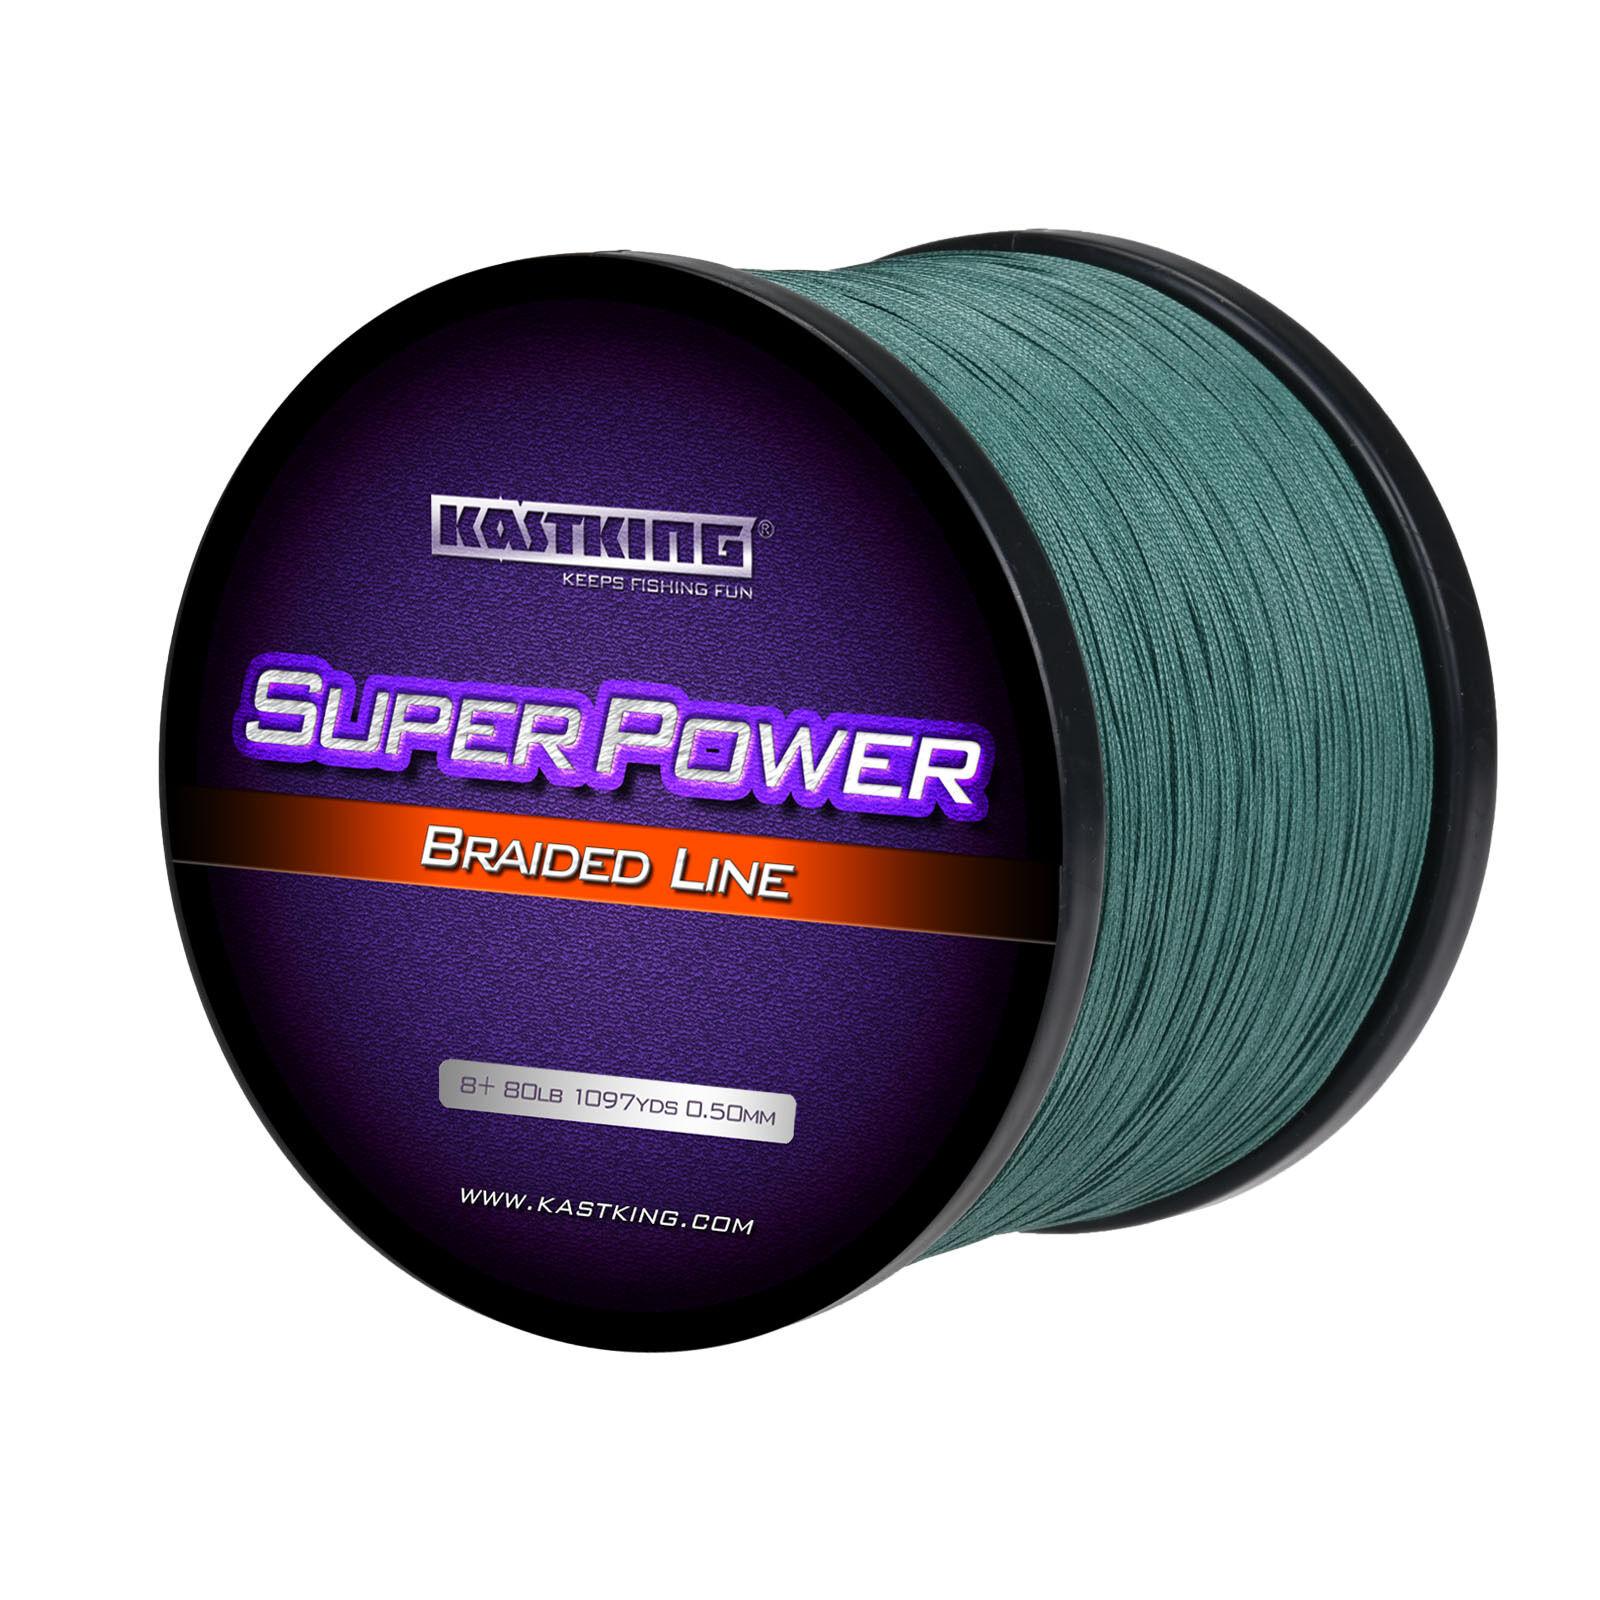 KASTKING SUPER POWER BRAID FISHING LINE -  MOSS GREEN - 1094YARD 65LB(8 STRANDS)  up to 70% off